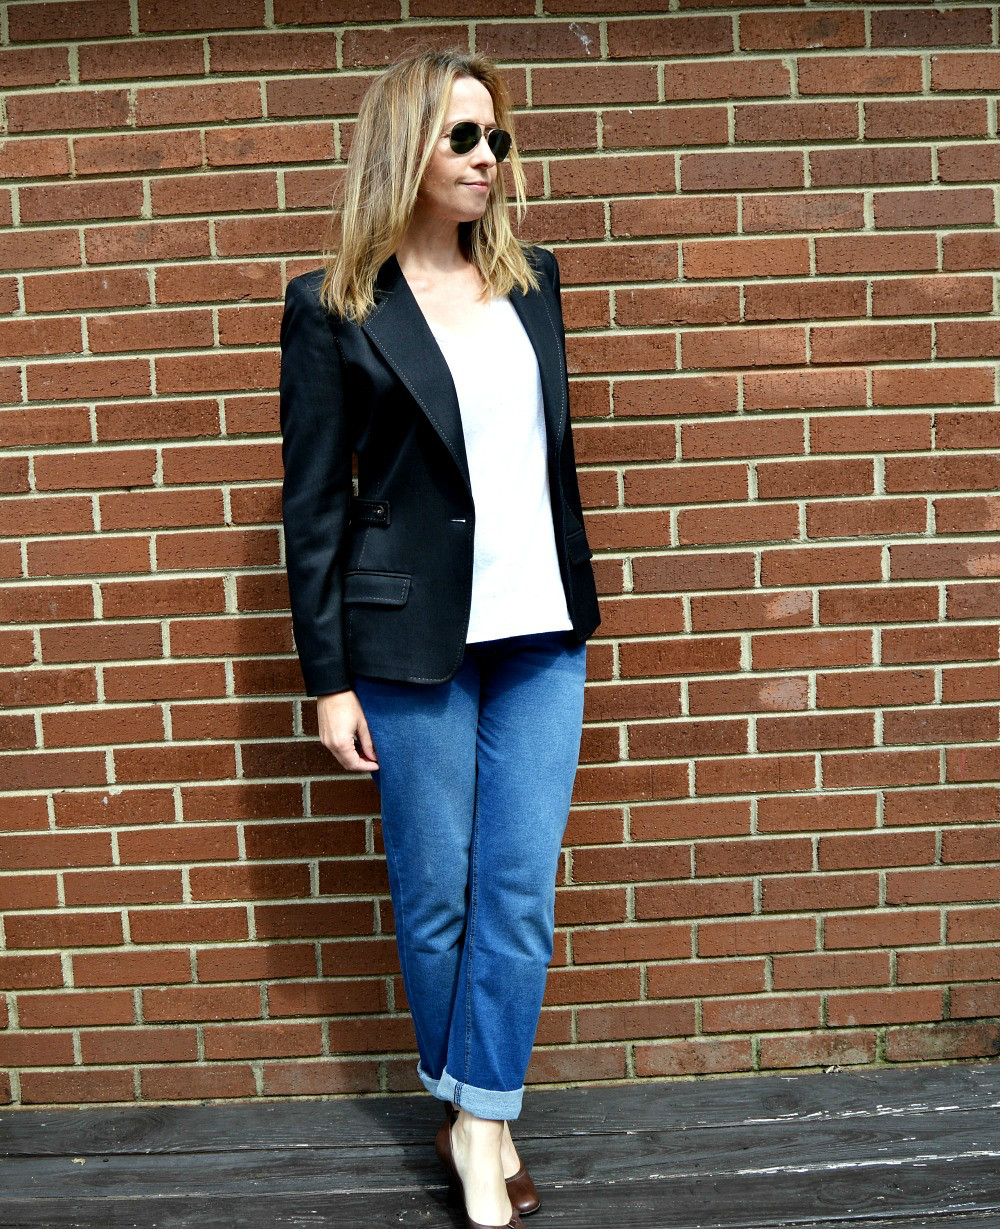 PajamaJeans & How I Style Them